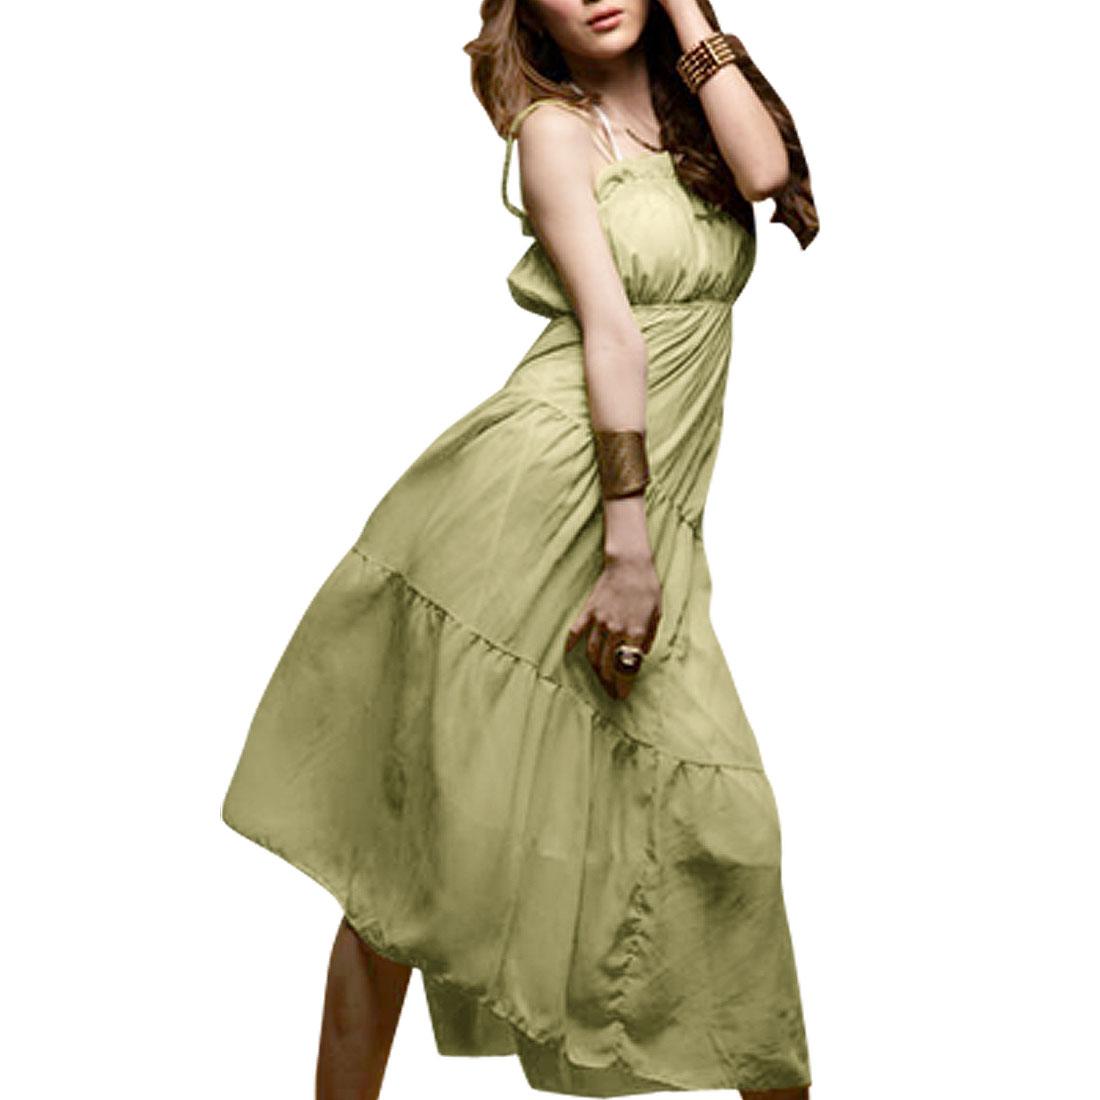 Adjustable Spaghetti Strap Chiffon Ruffles Bust Maxi Dress for Lady S